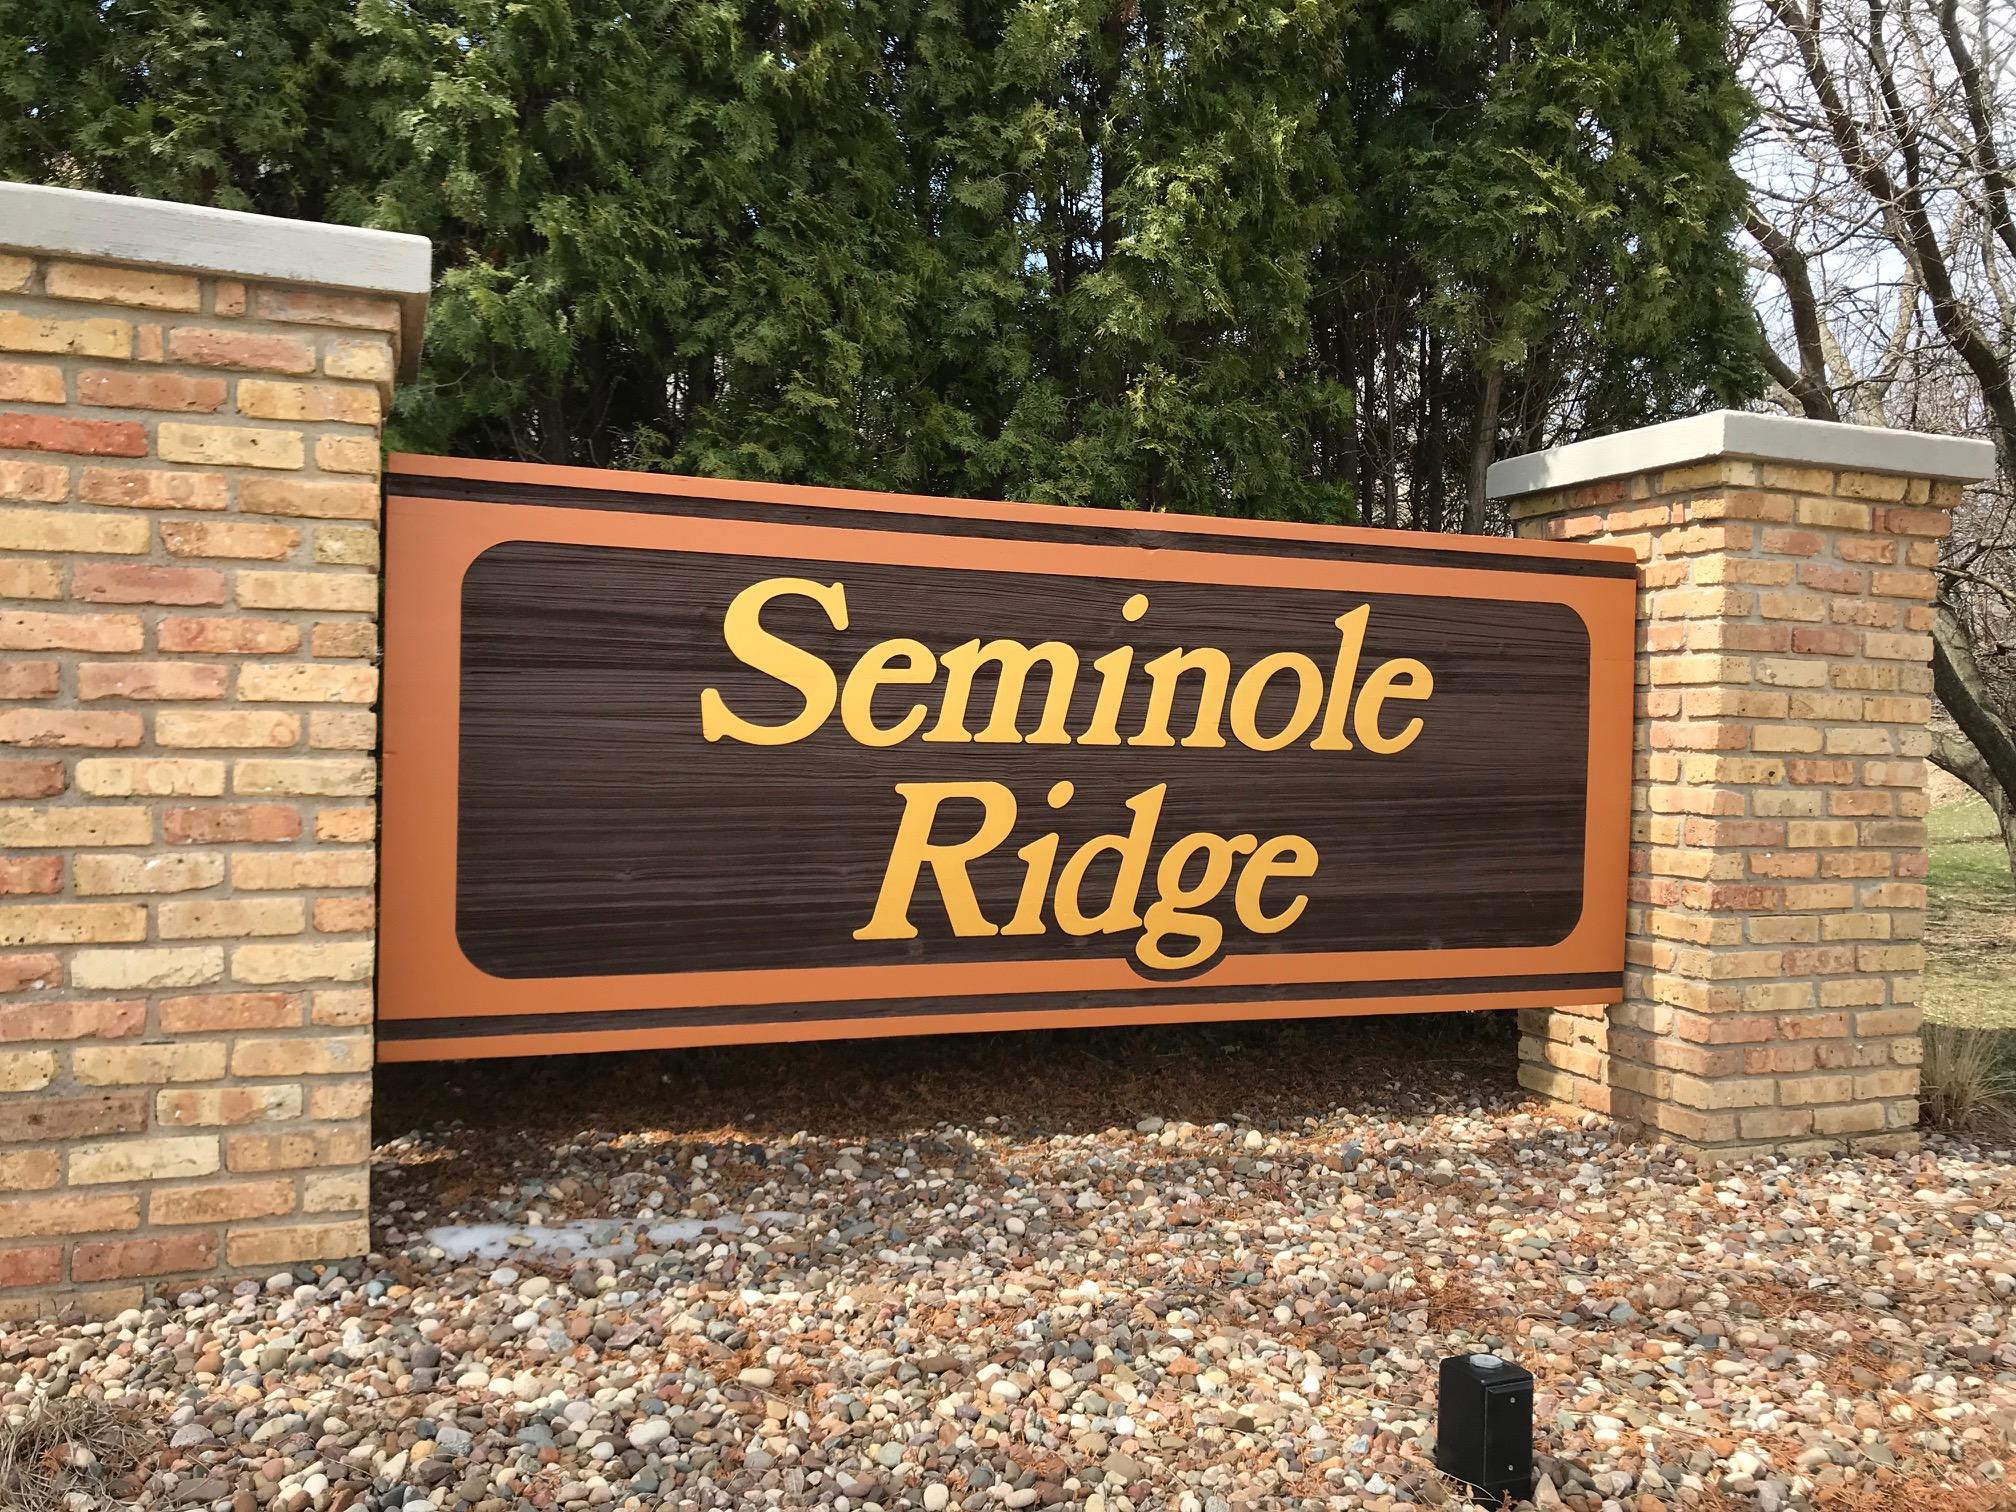 Seminole Ridge